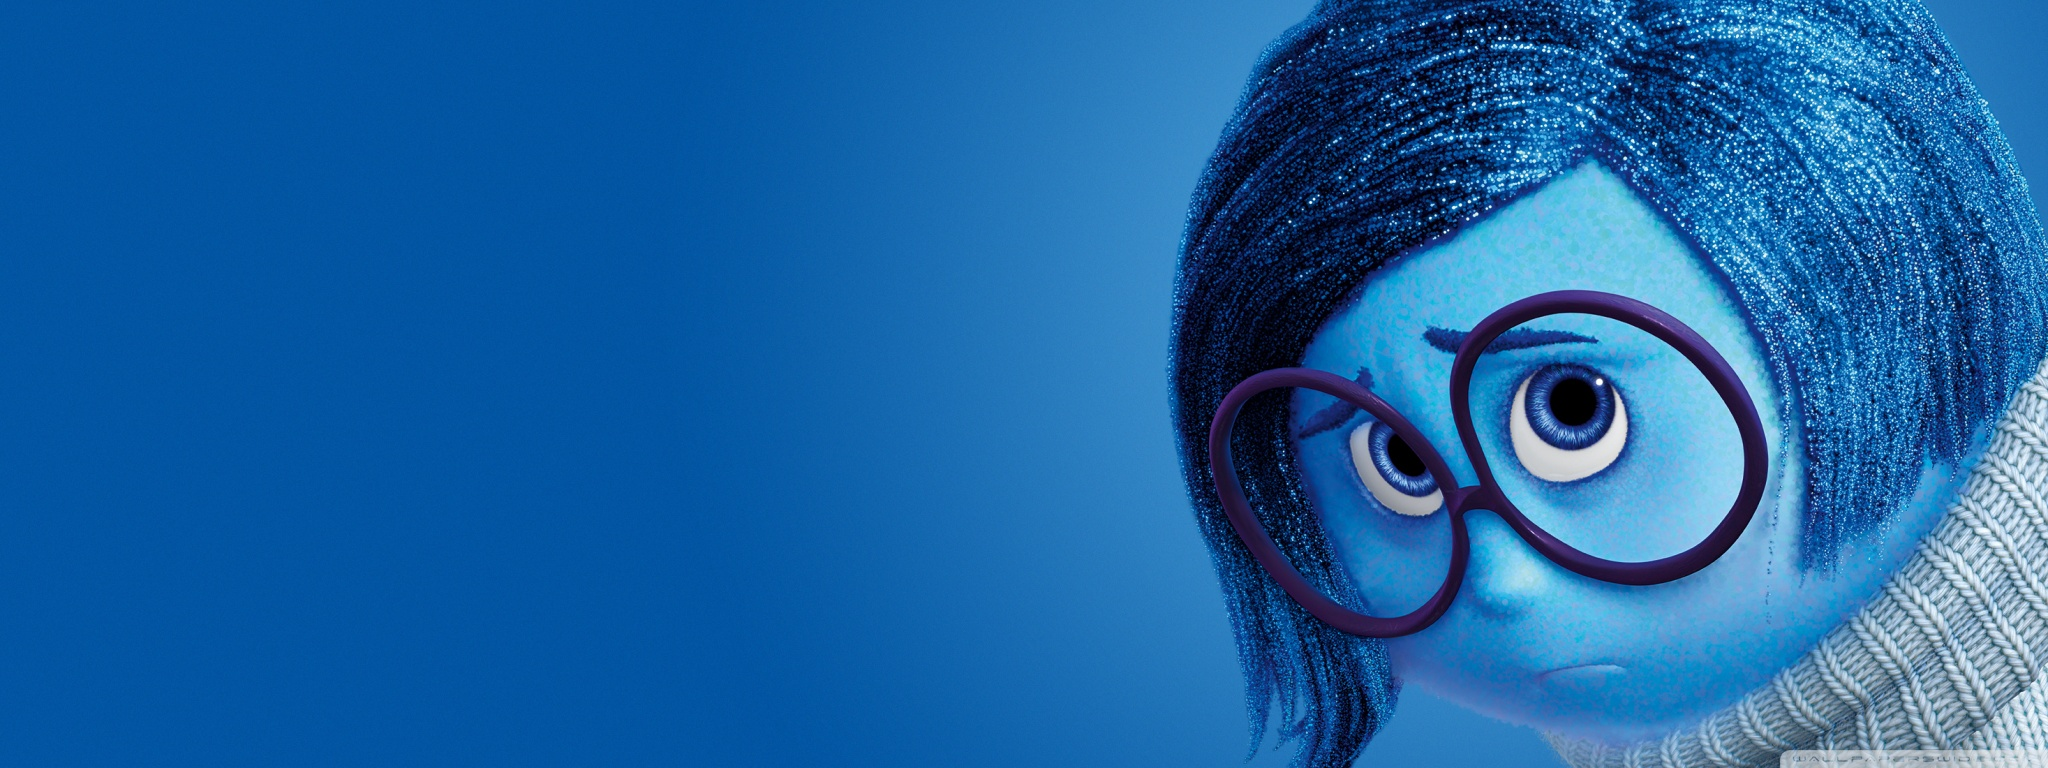 Inside Out Sadness   Disney Pixar 4K HD Desktop Wallpaper for 2048x768